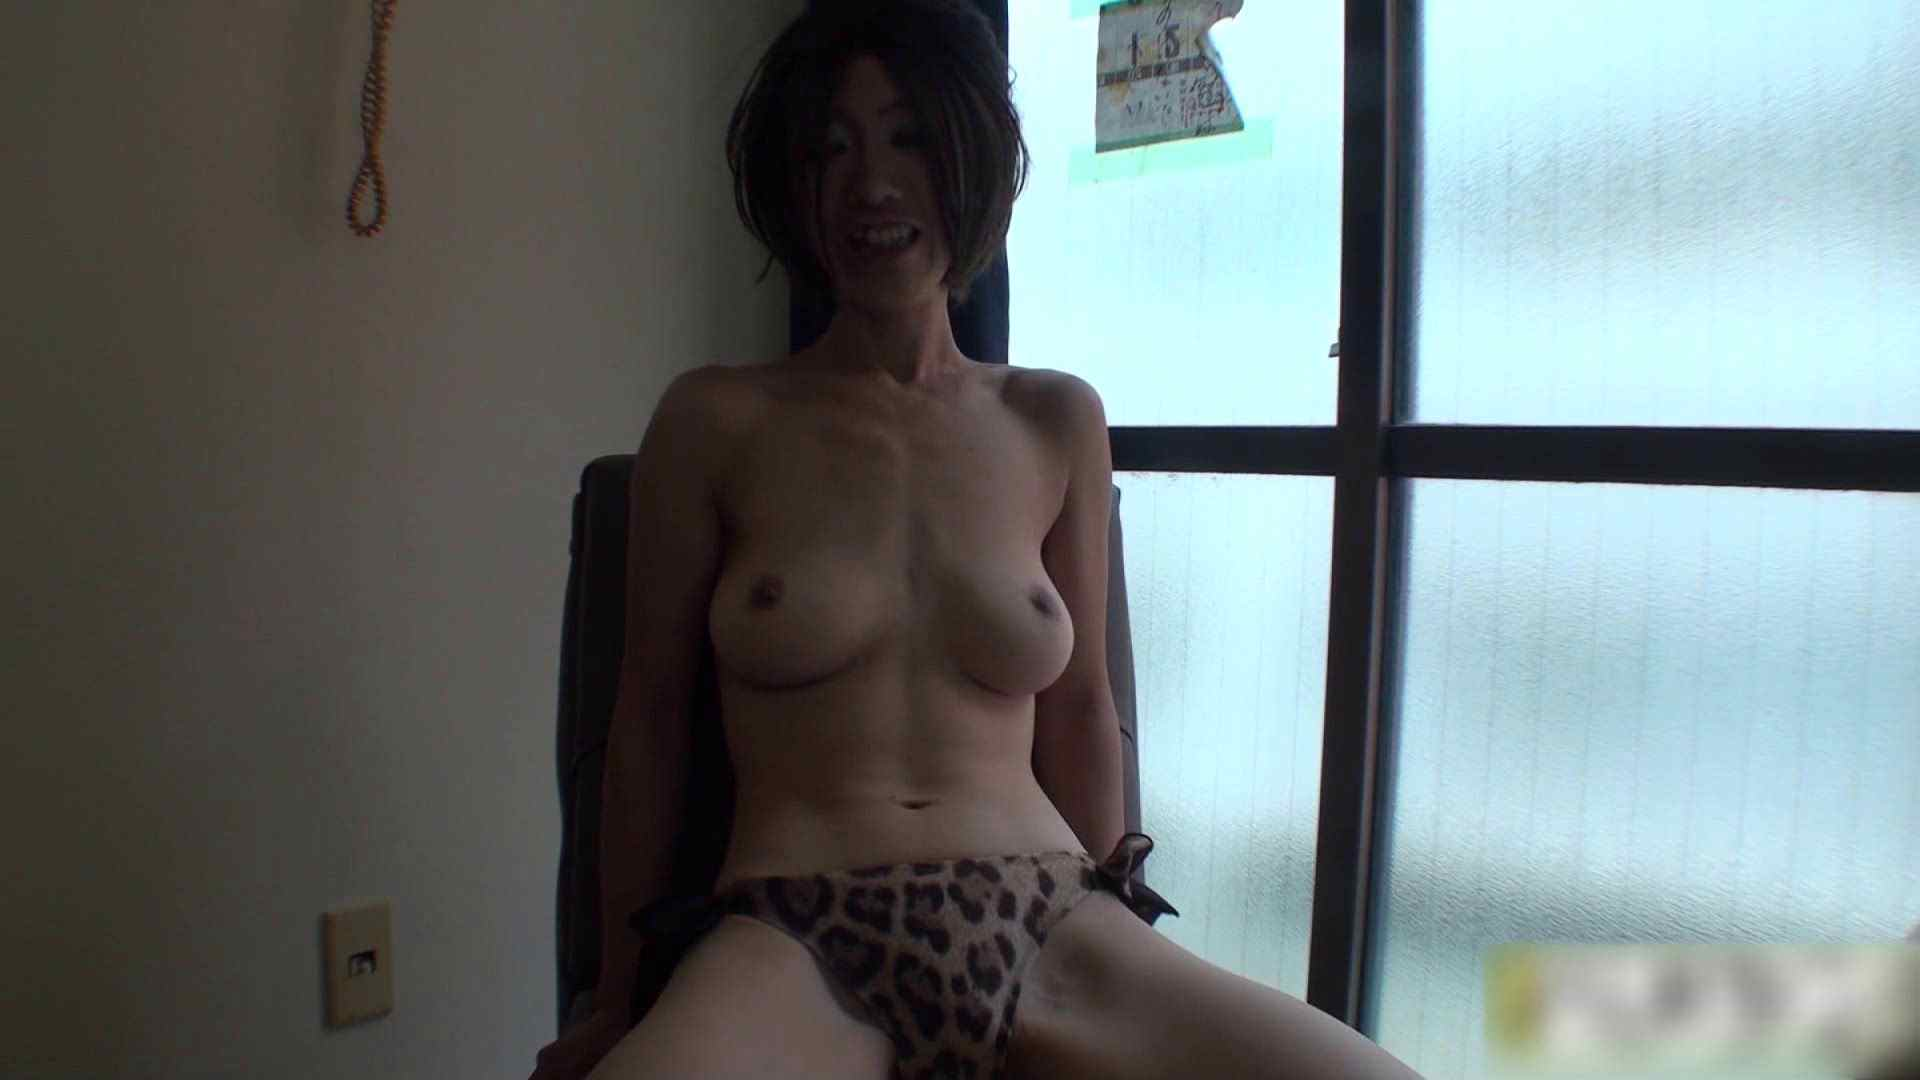 S級厳選美女ビッチガールVol.46 SEX 盗撮動画紹介 60画像 19